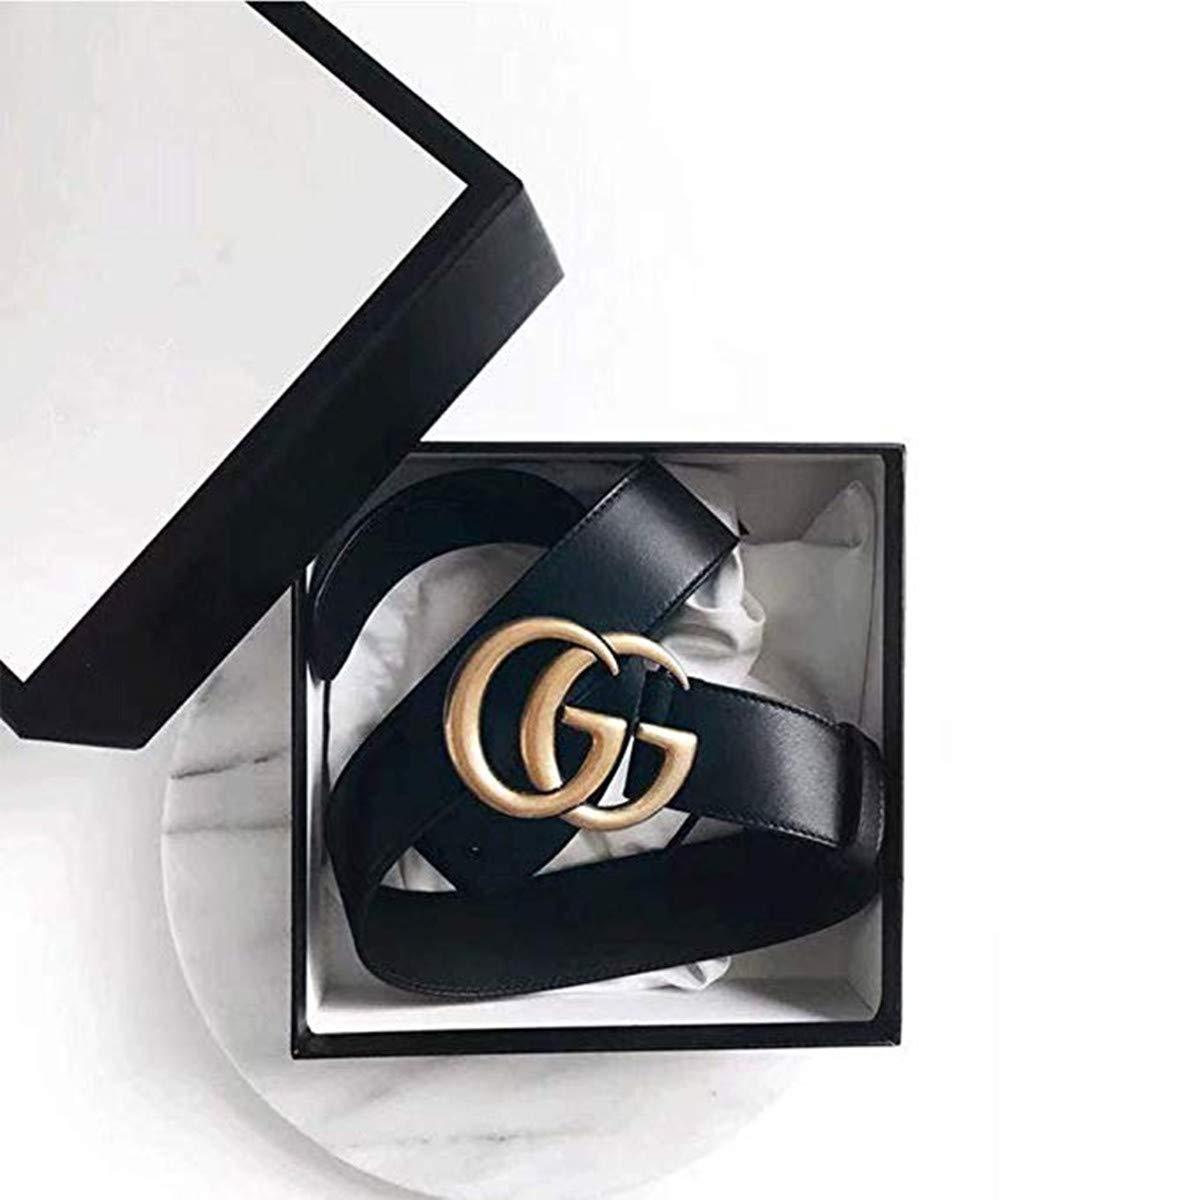 GG Buckle Belt for Women Black Leather